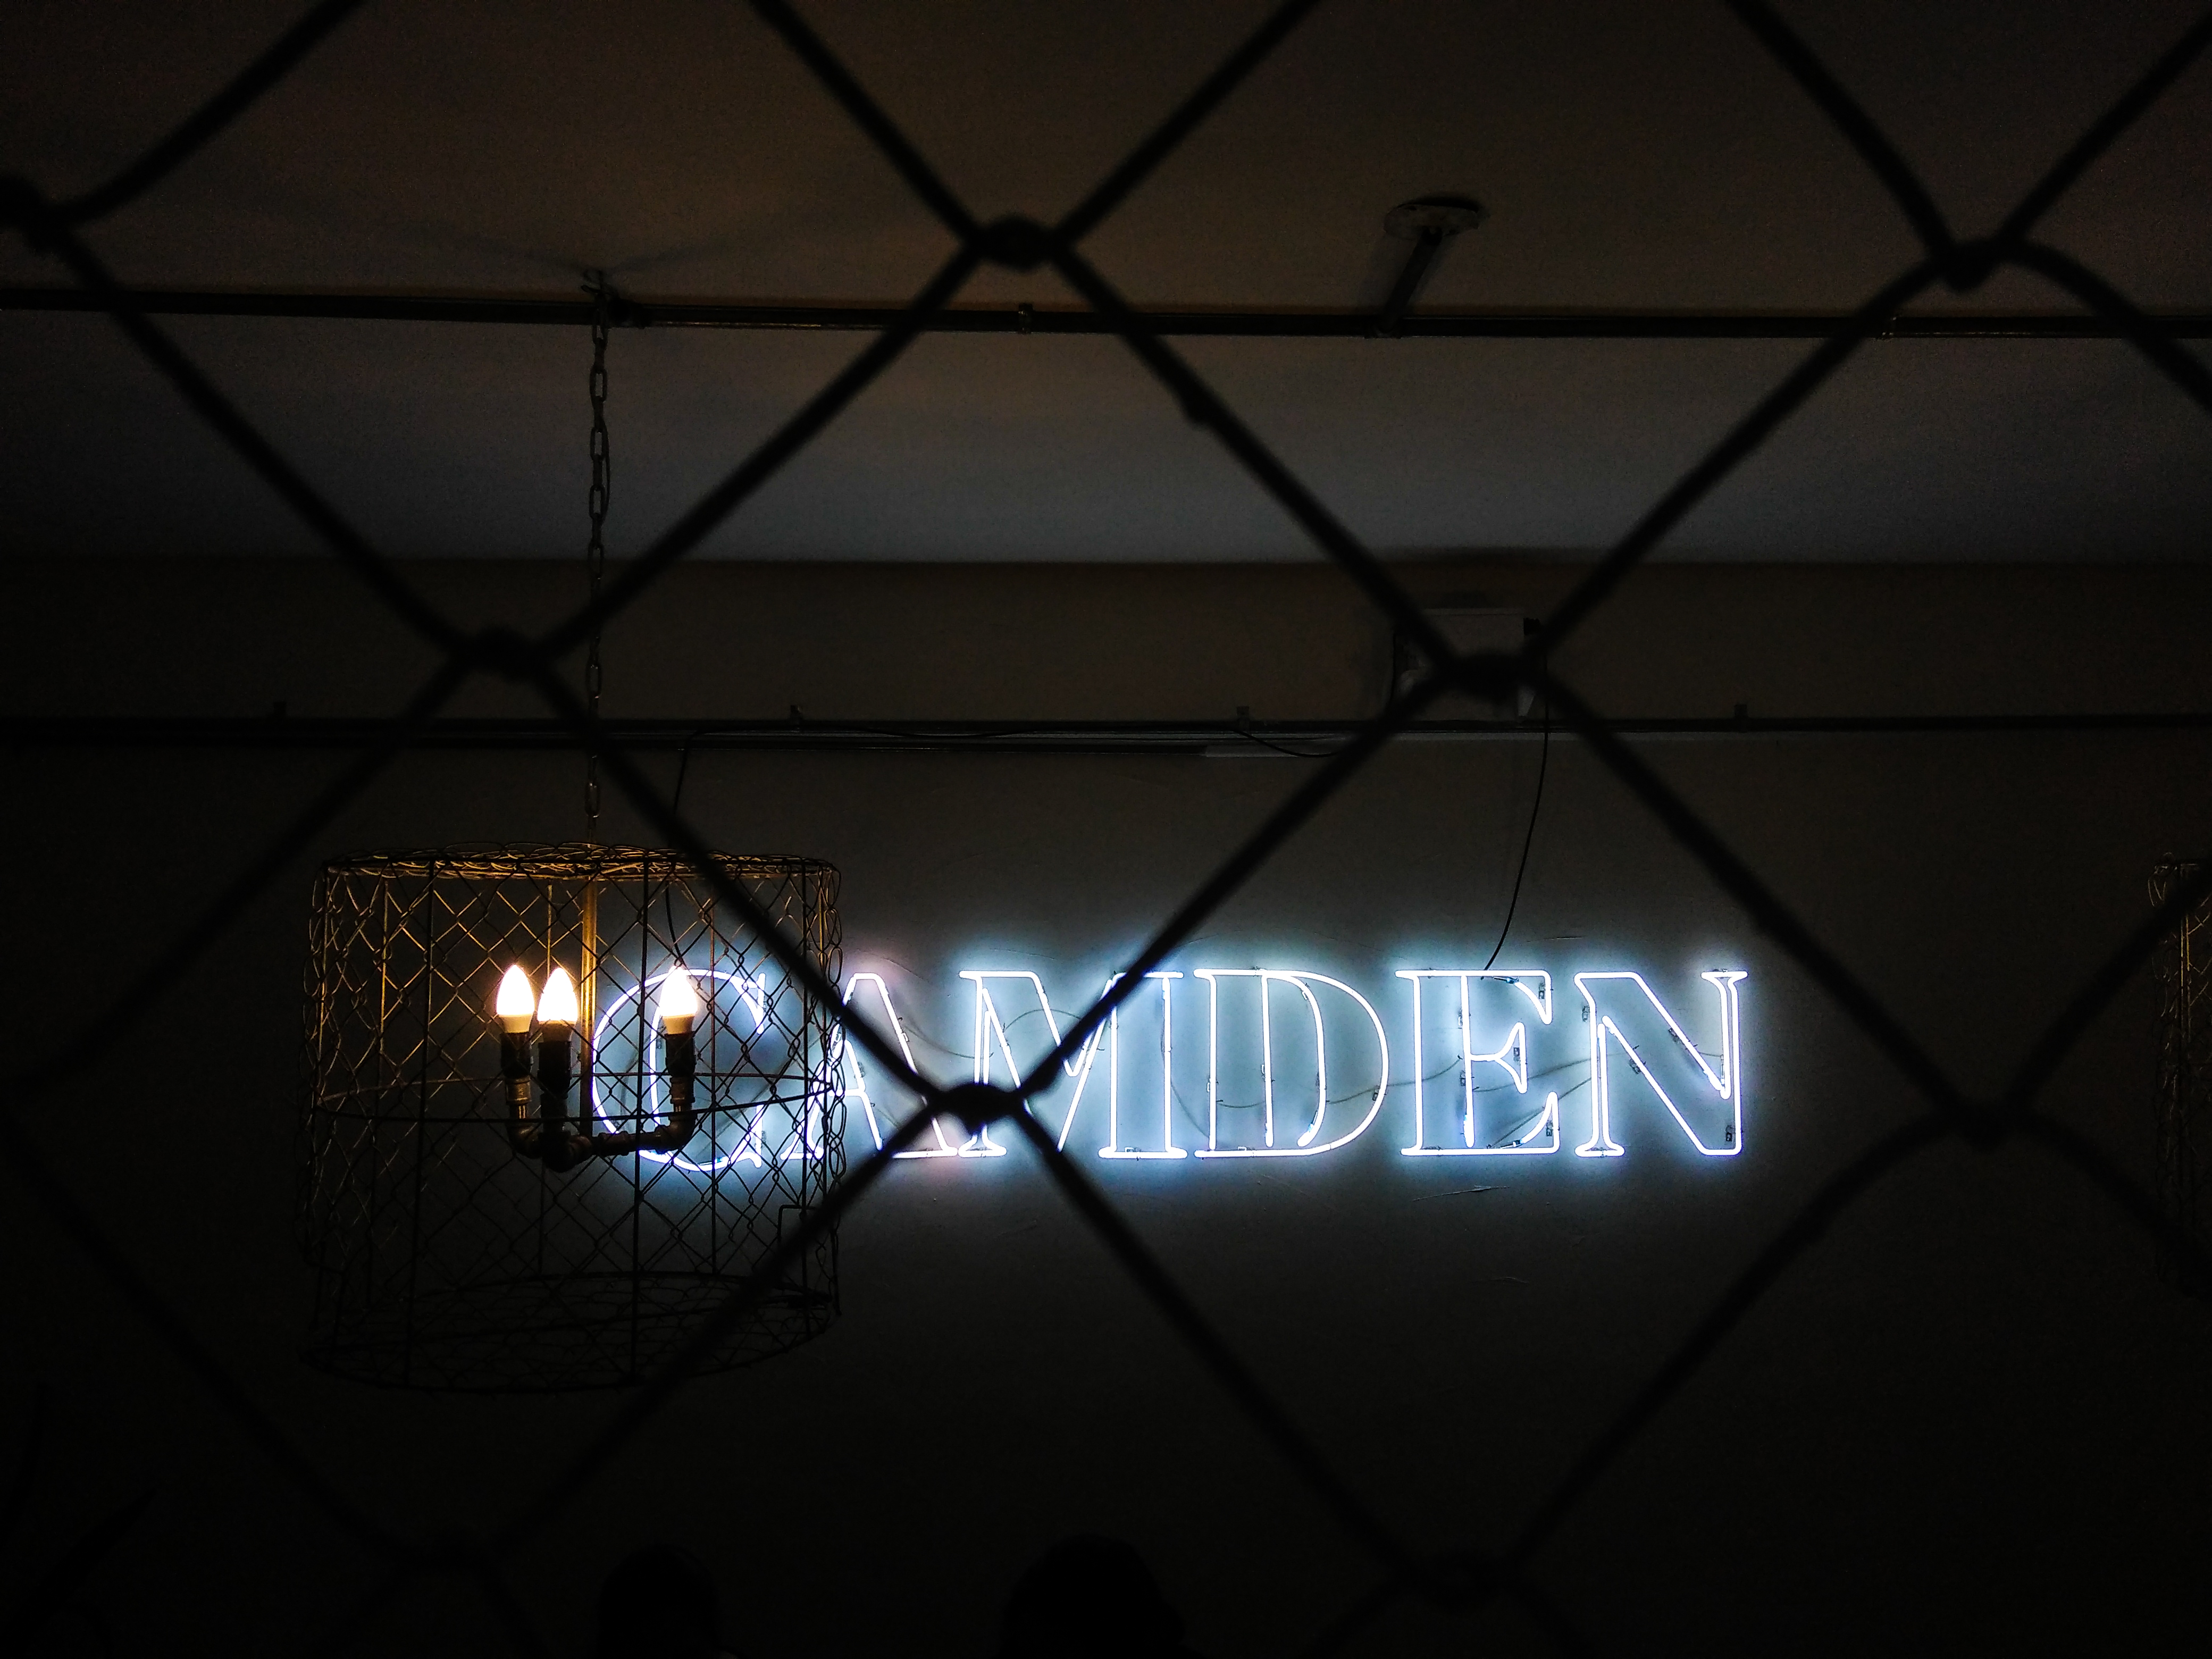 camden-cebu-city-9